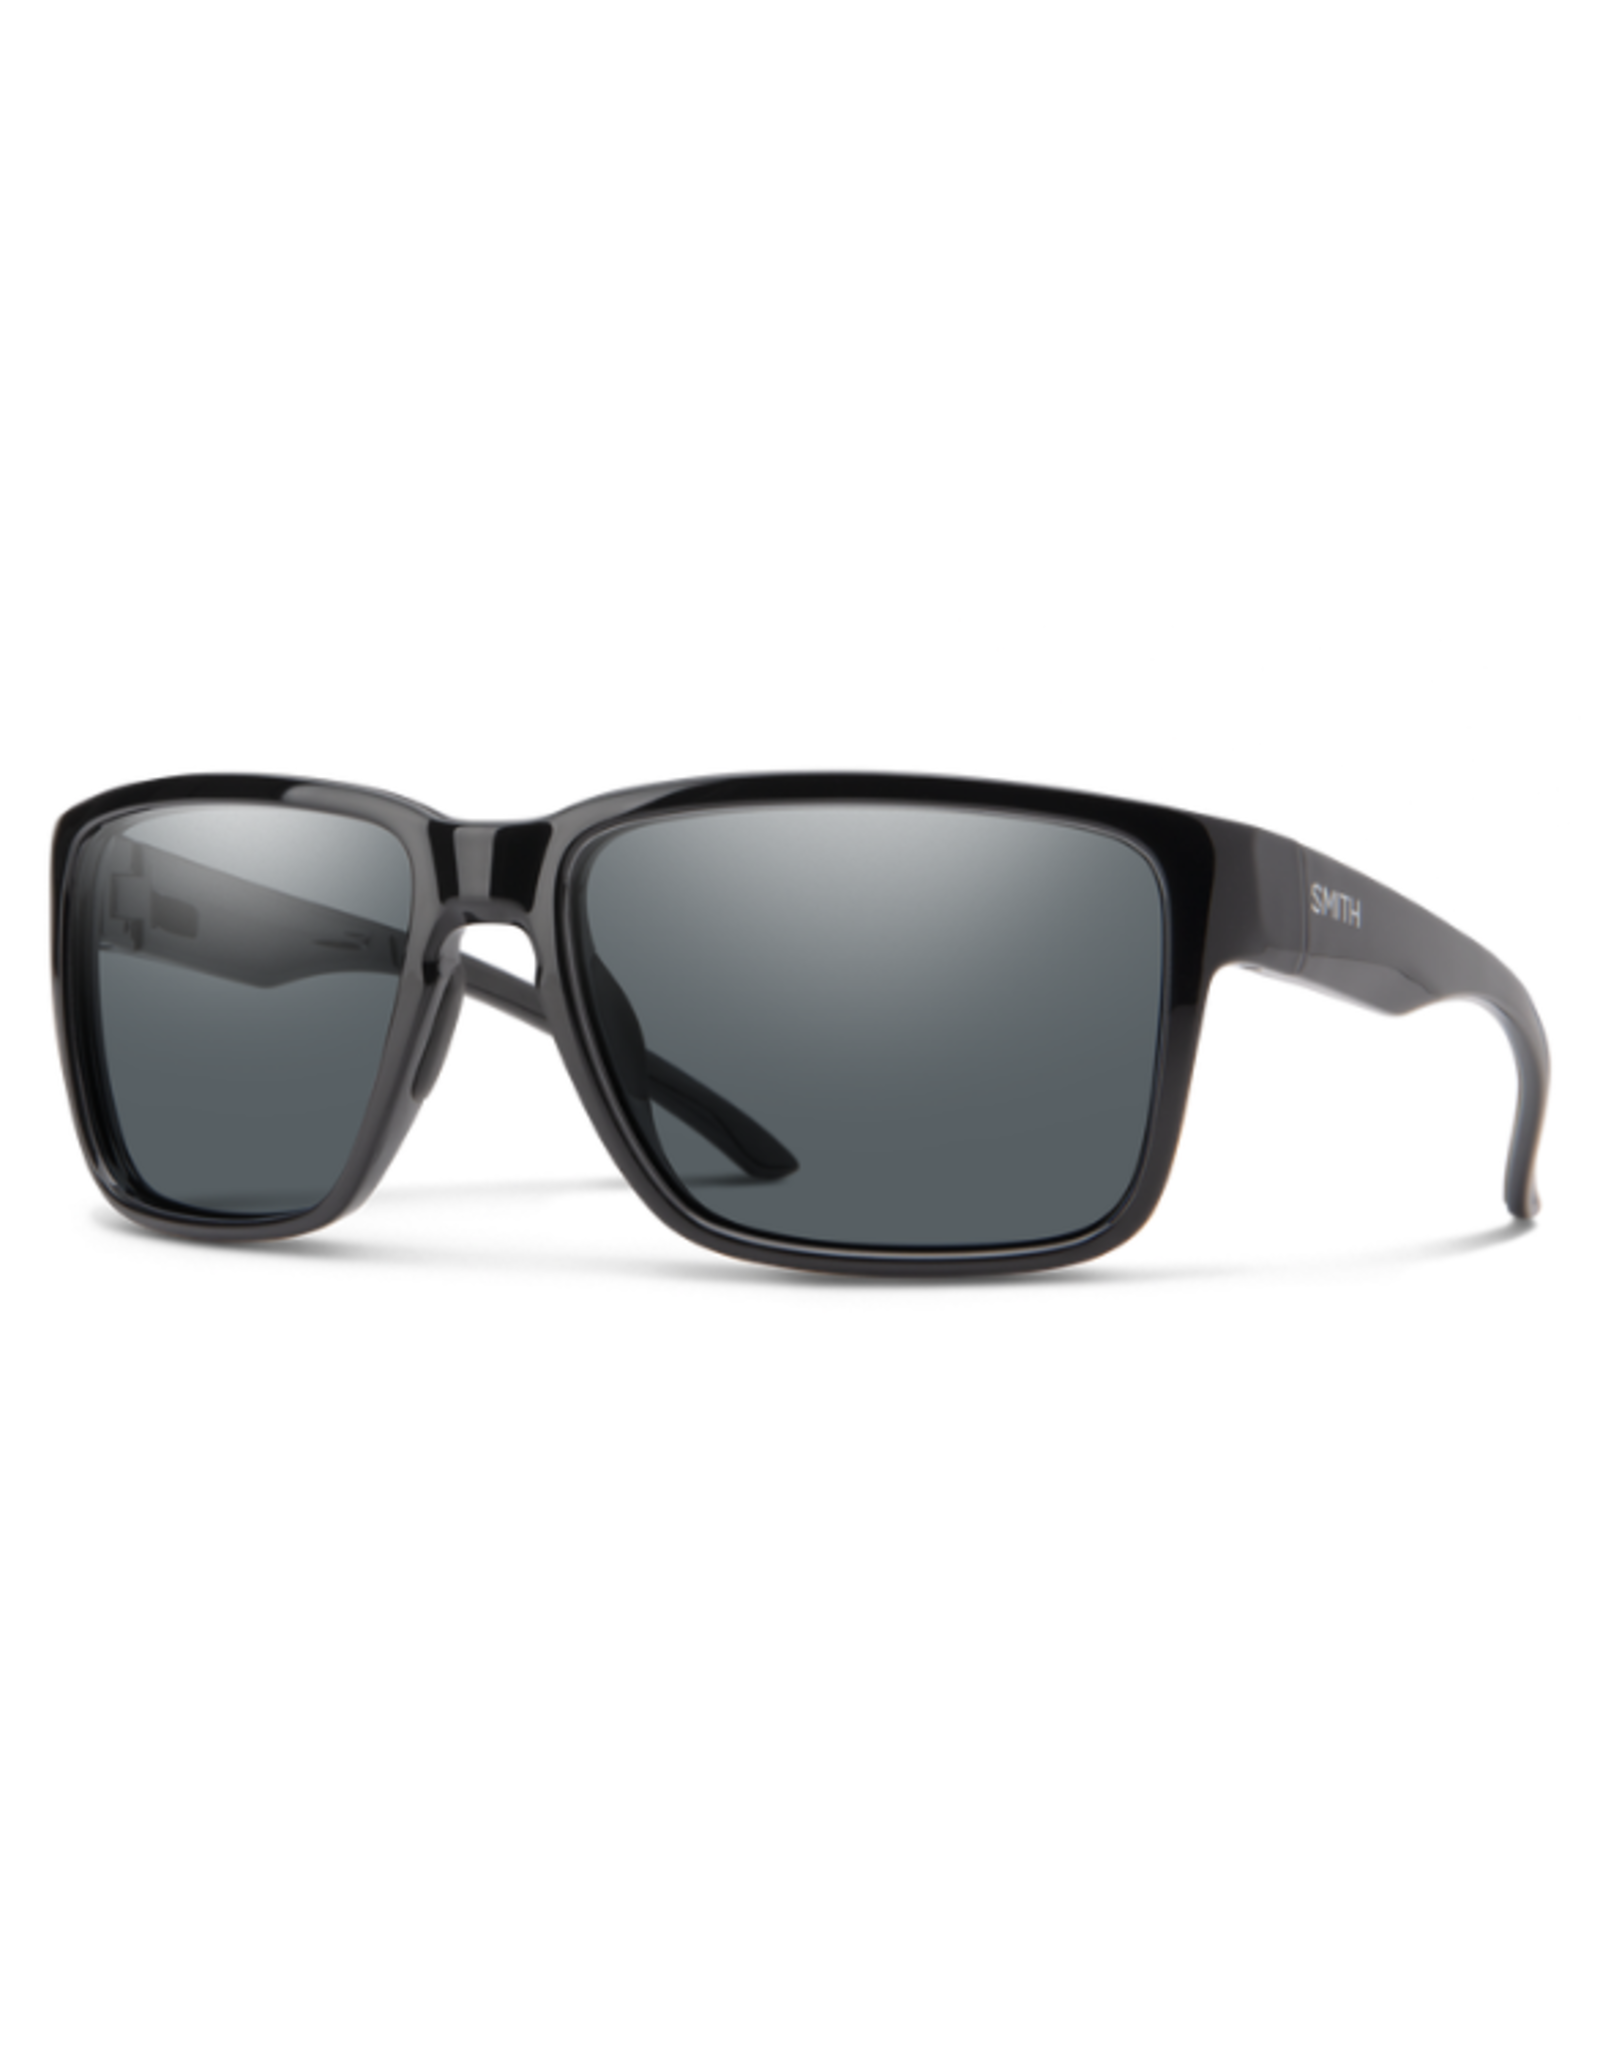 Smith Optics Smith Emerge Black Polarized Grey